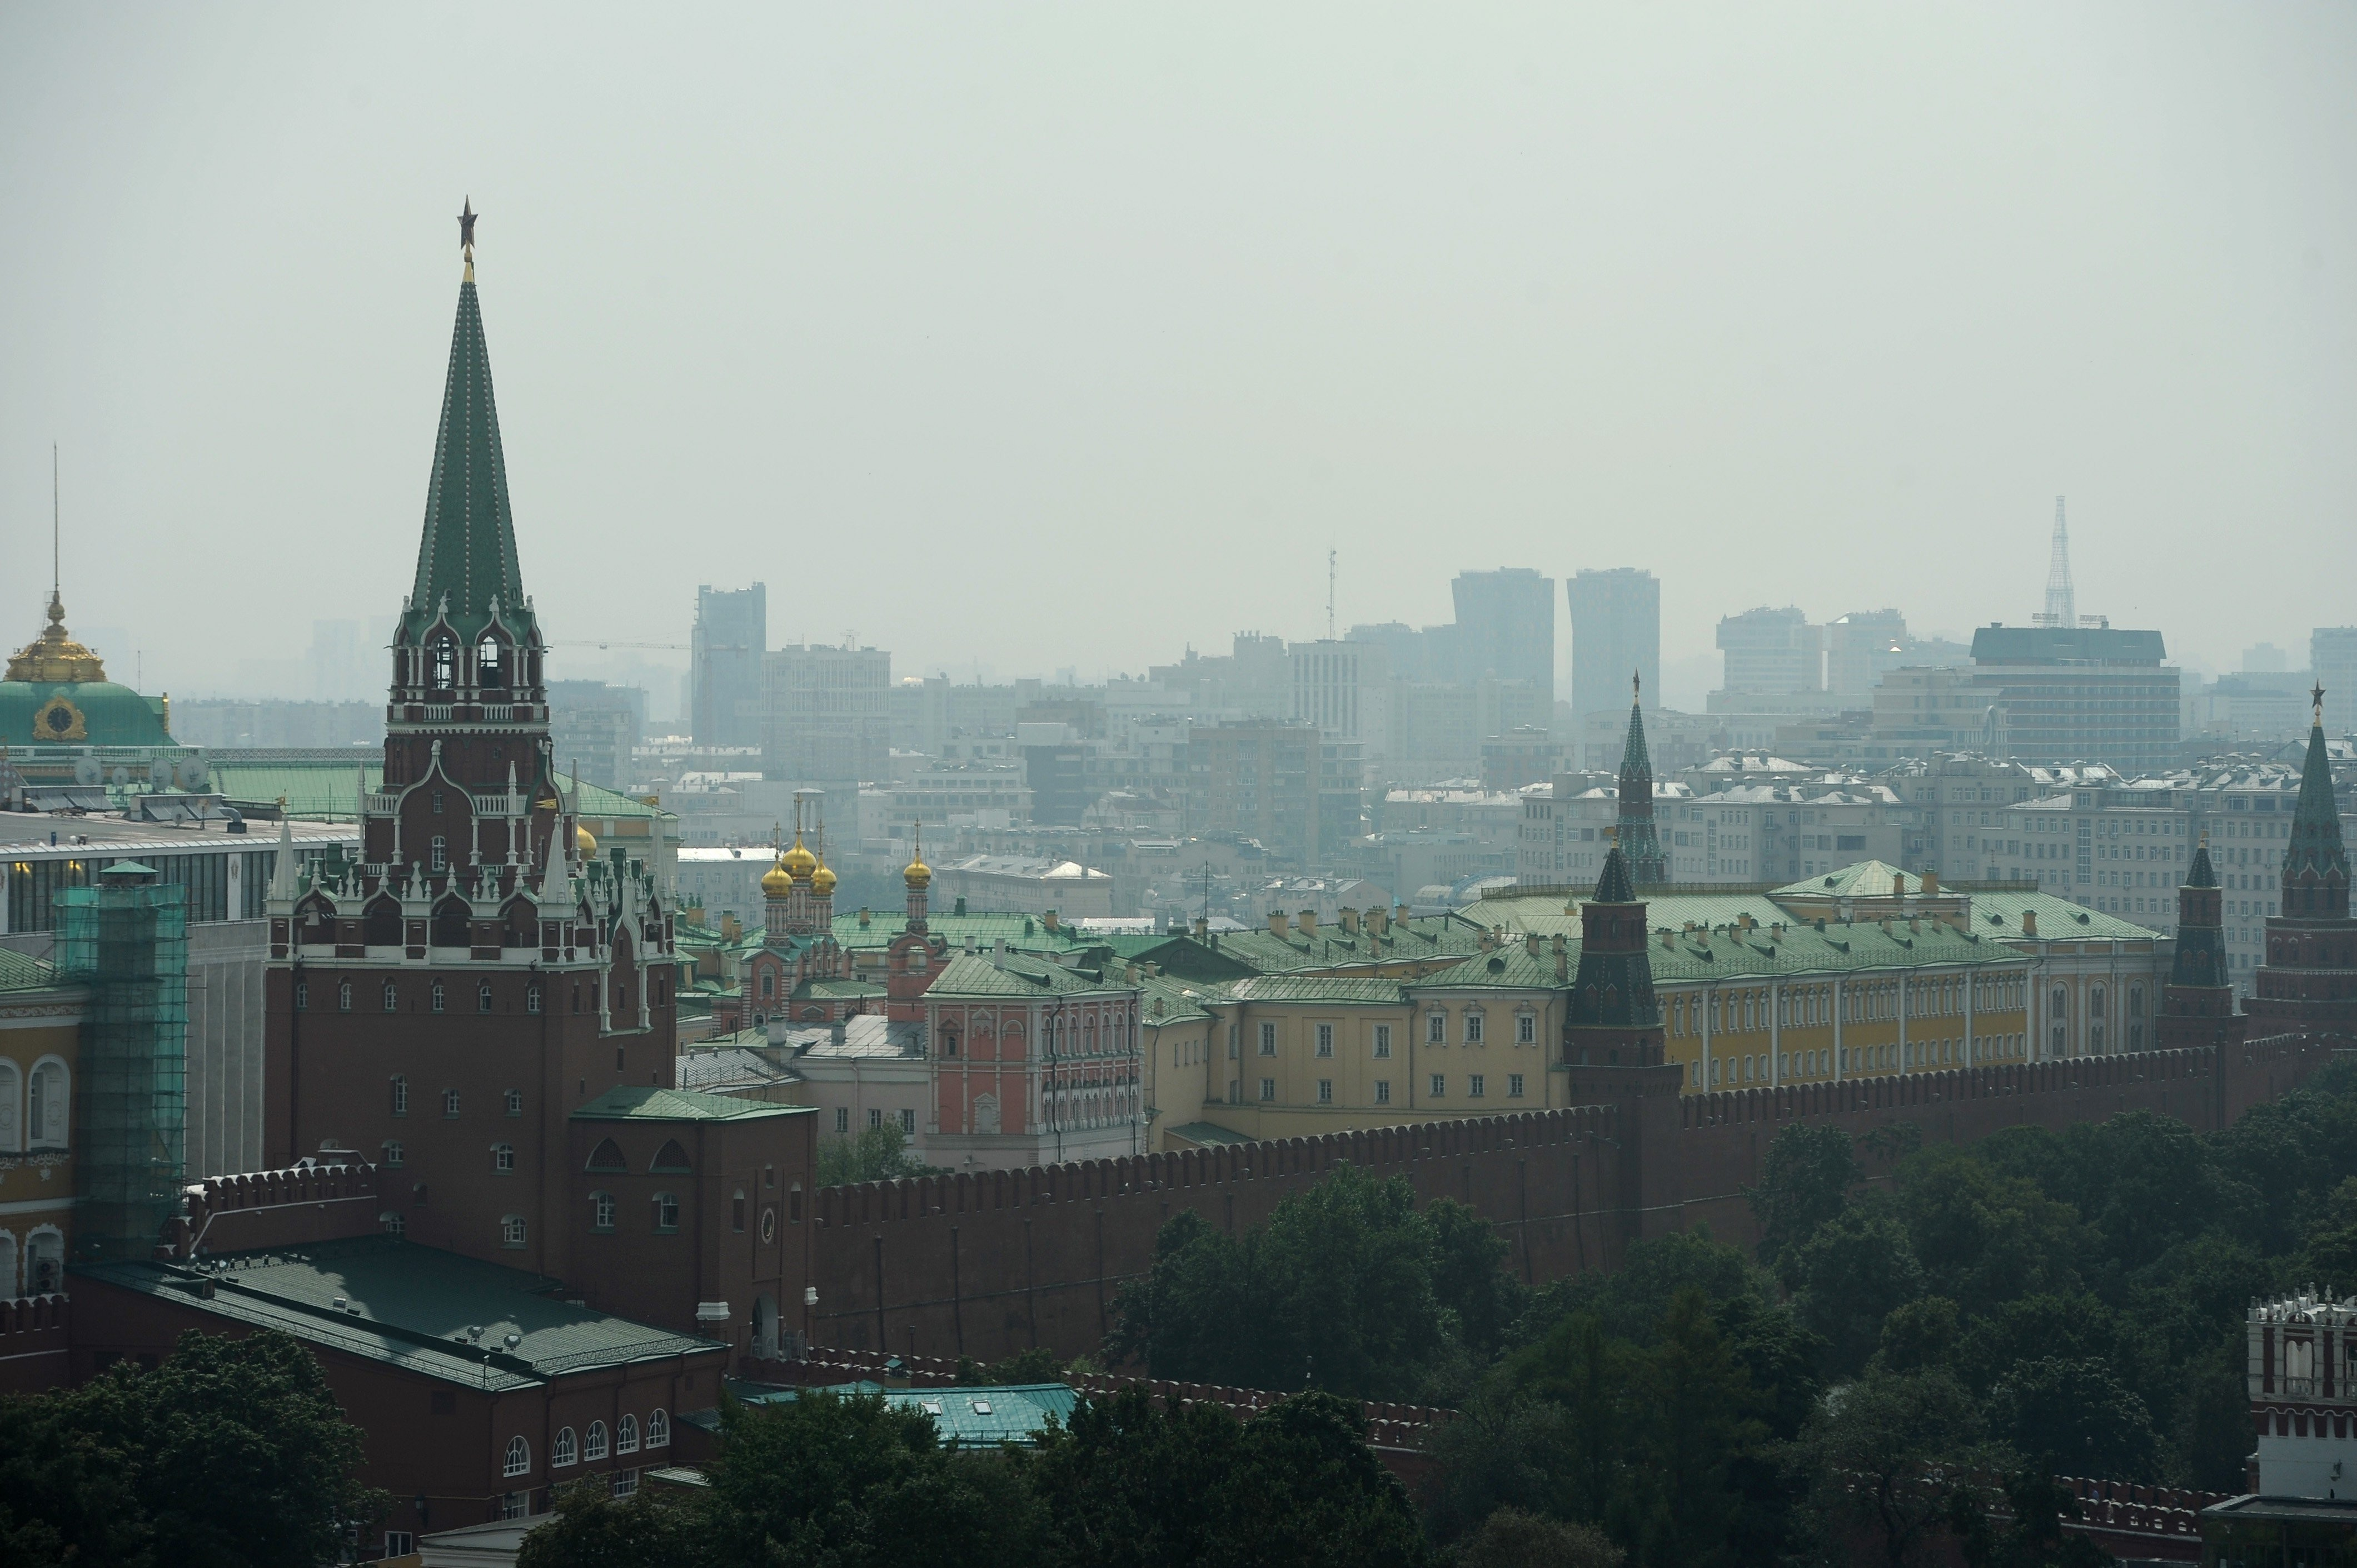 <p>Фото: &copy; Агентство городских новостей &laquo;Москва&raquo;/<span>Любимов Андрей</span></p>